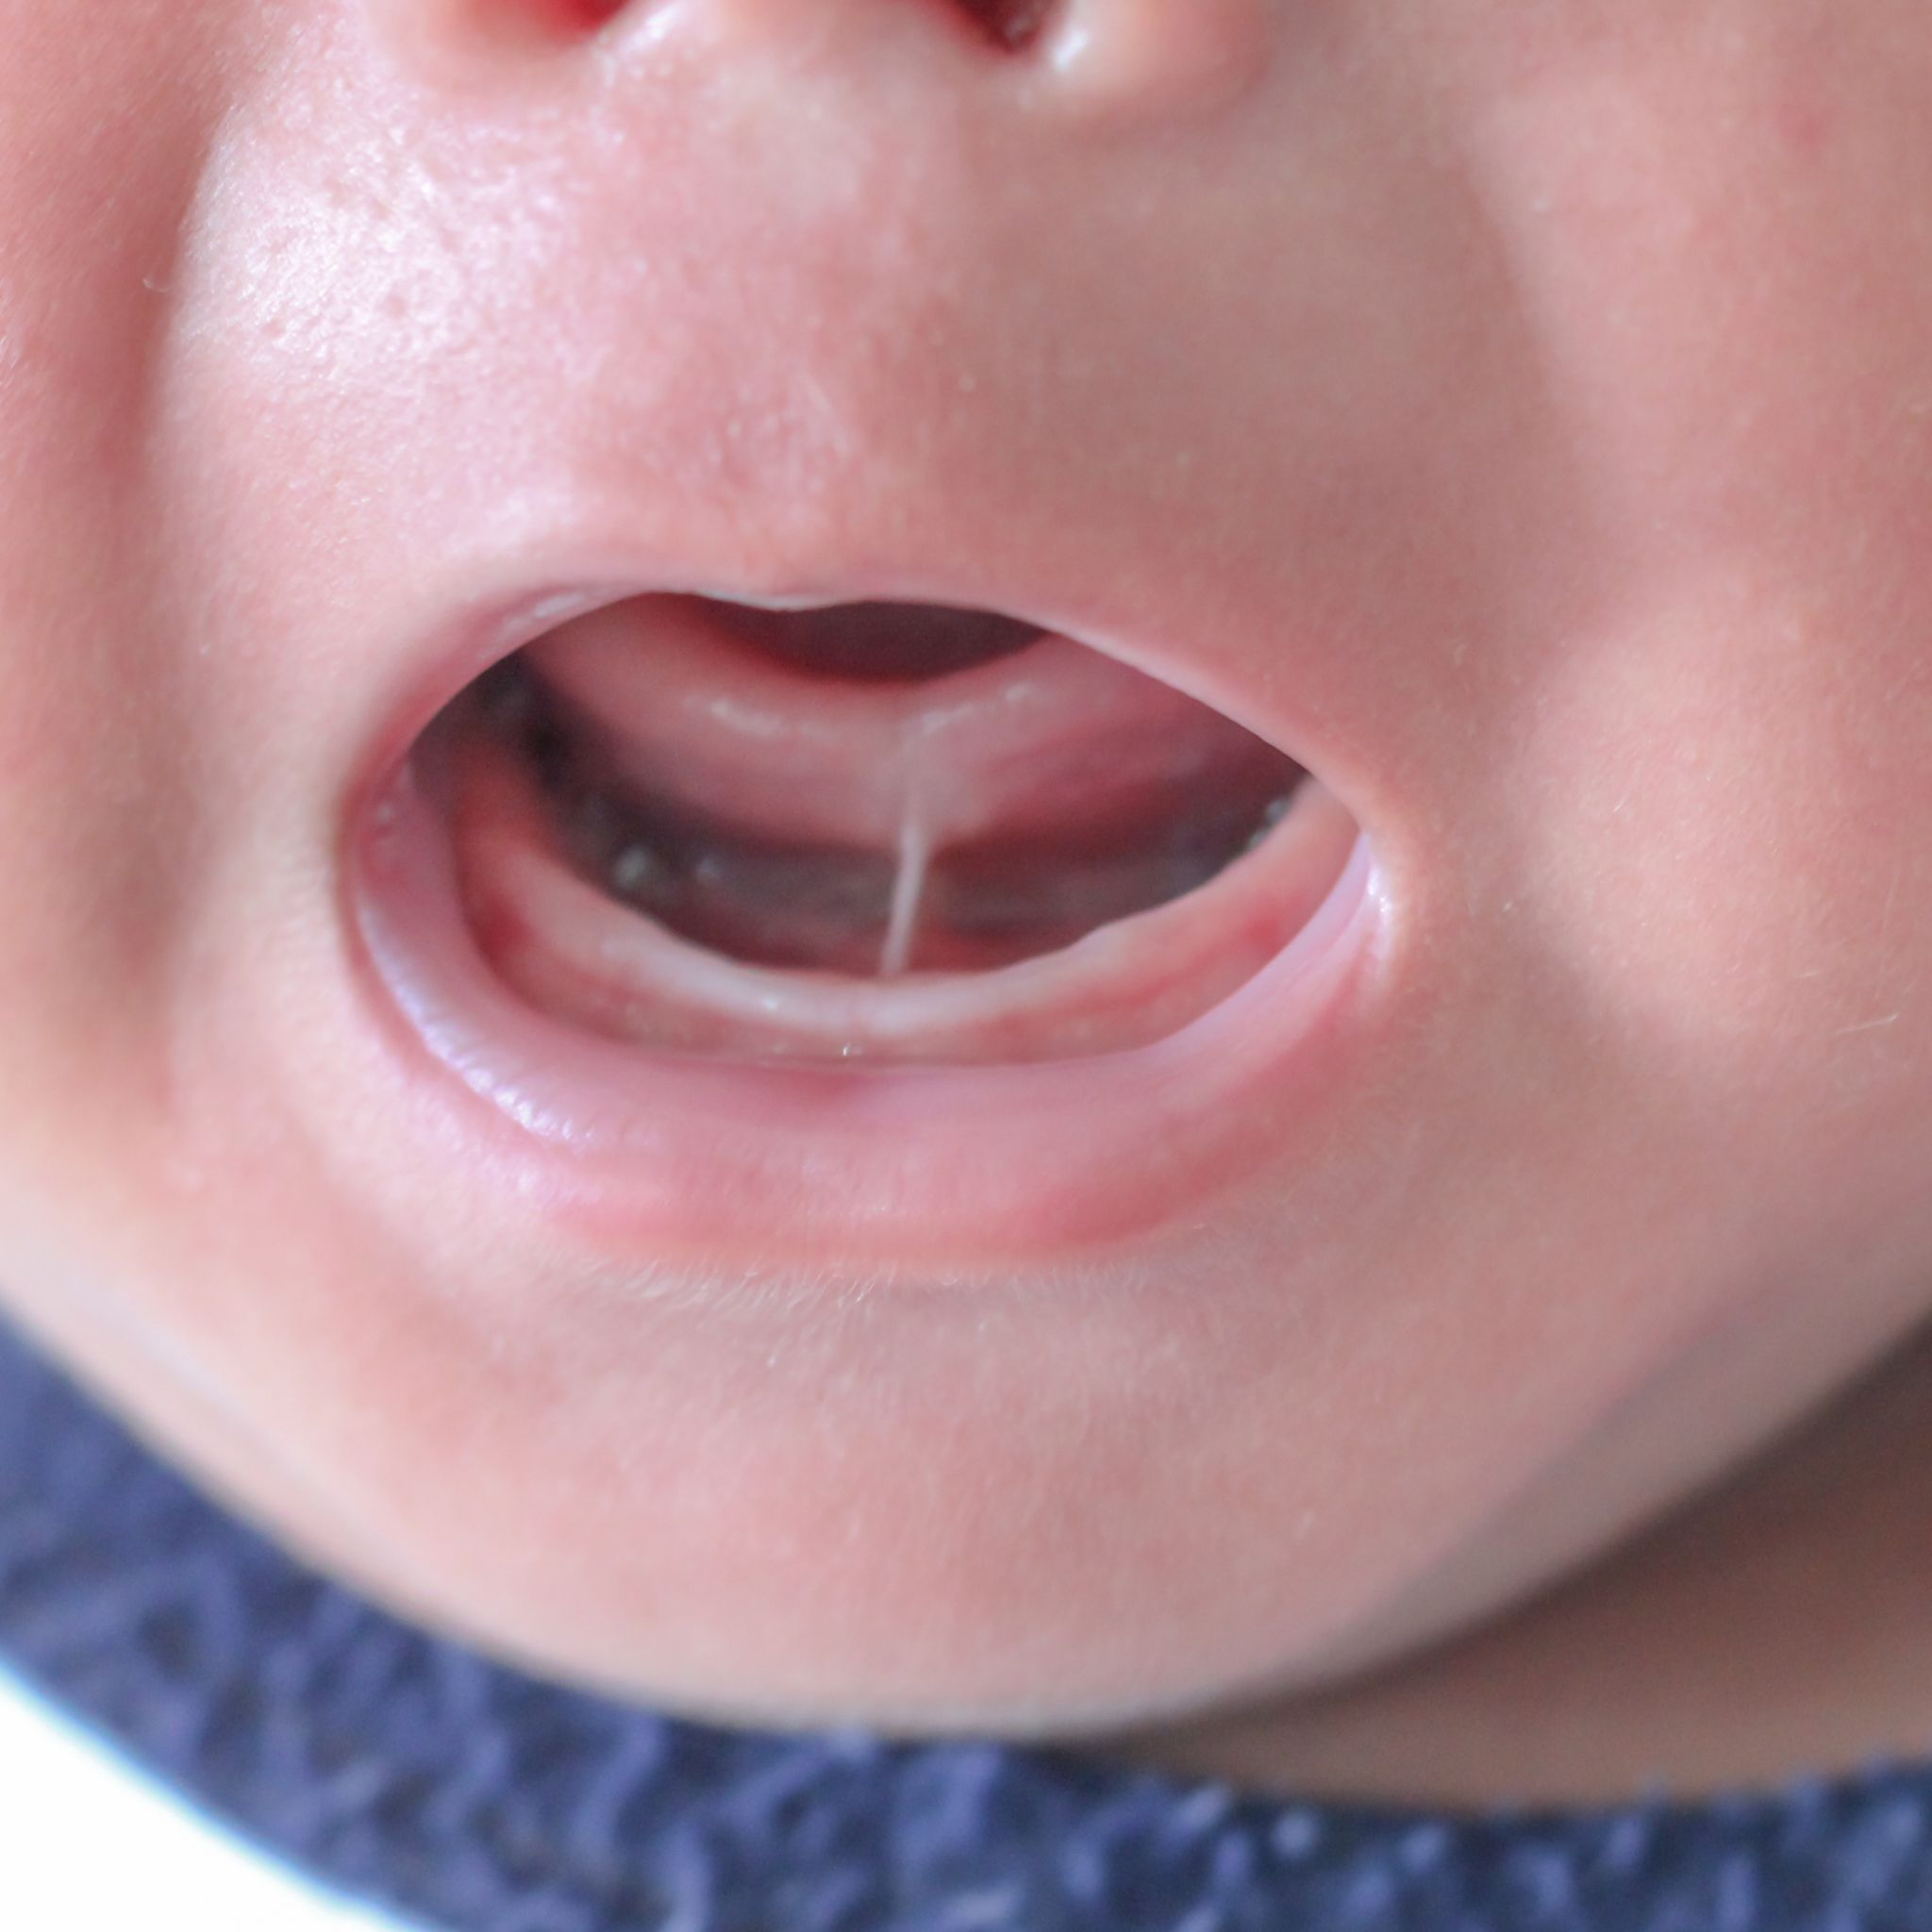 Dr. Sharona Discusses Tongue-Tie in Children